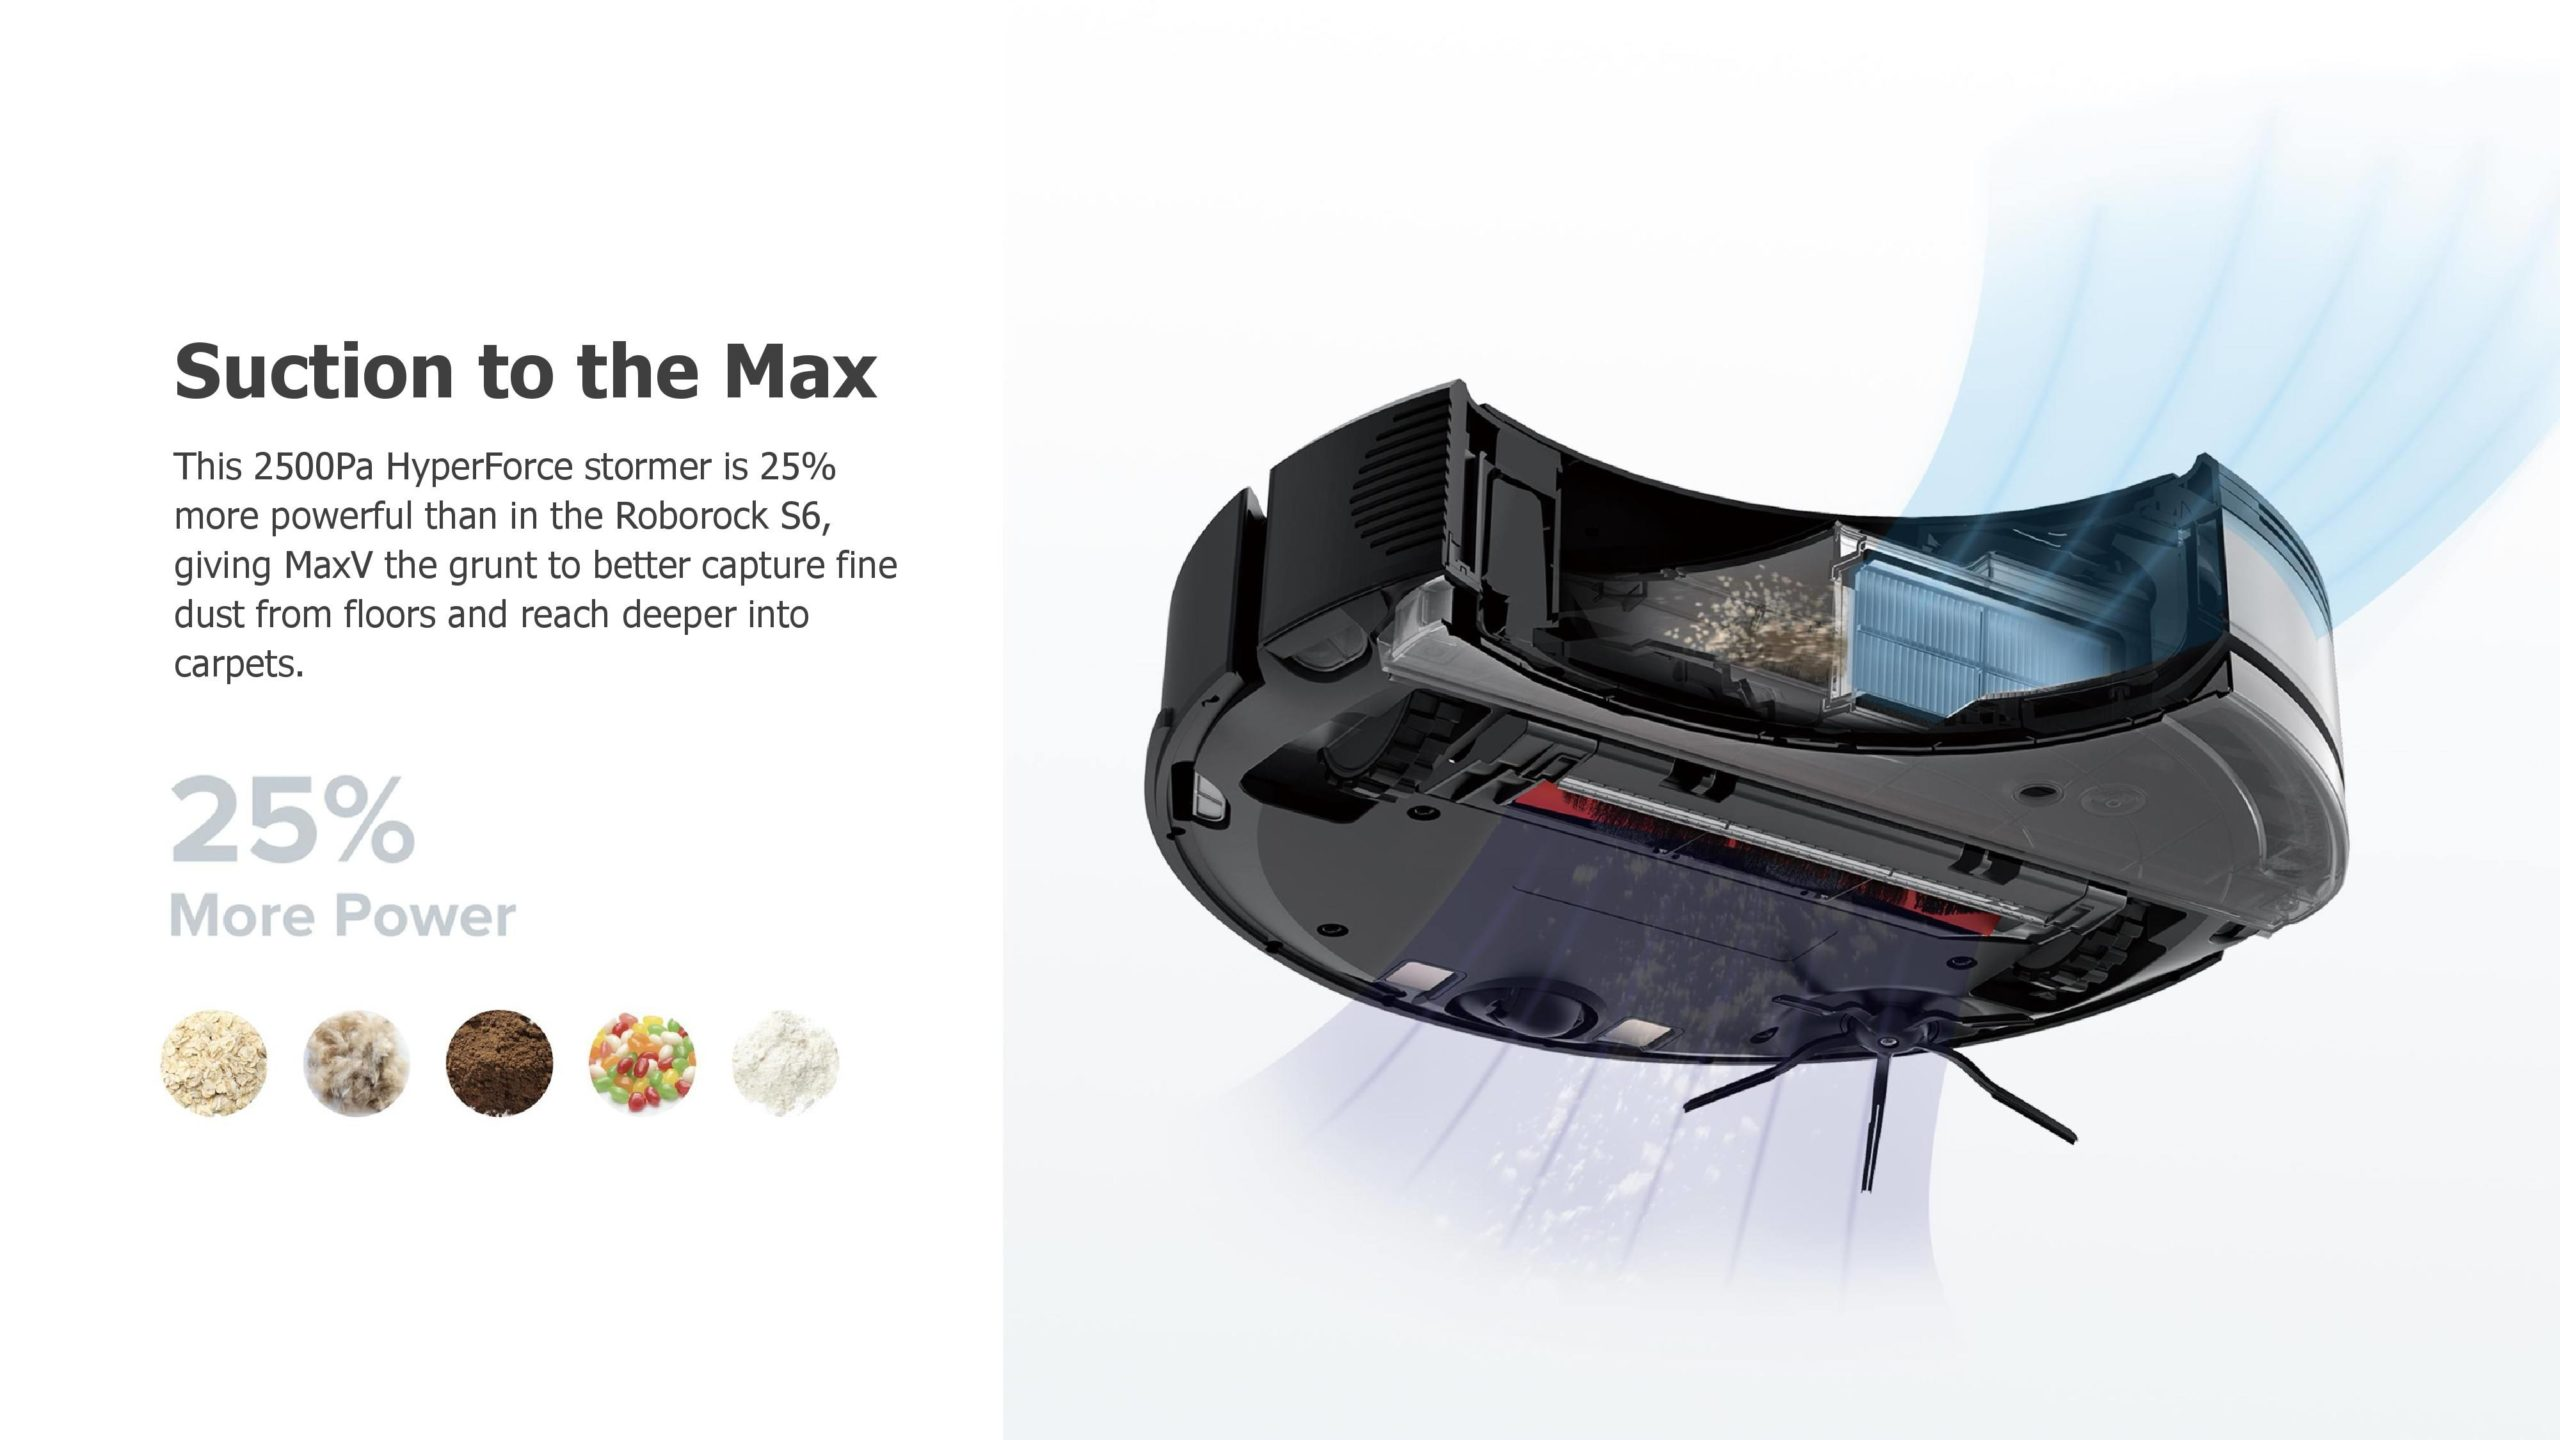 Roborock S6 Maxv 12